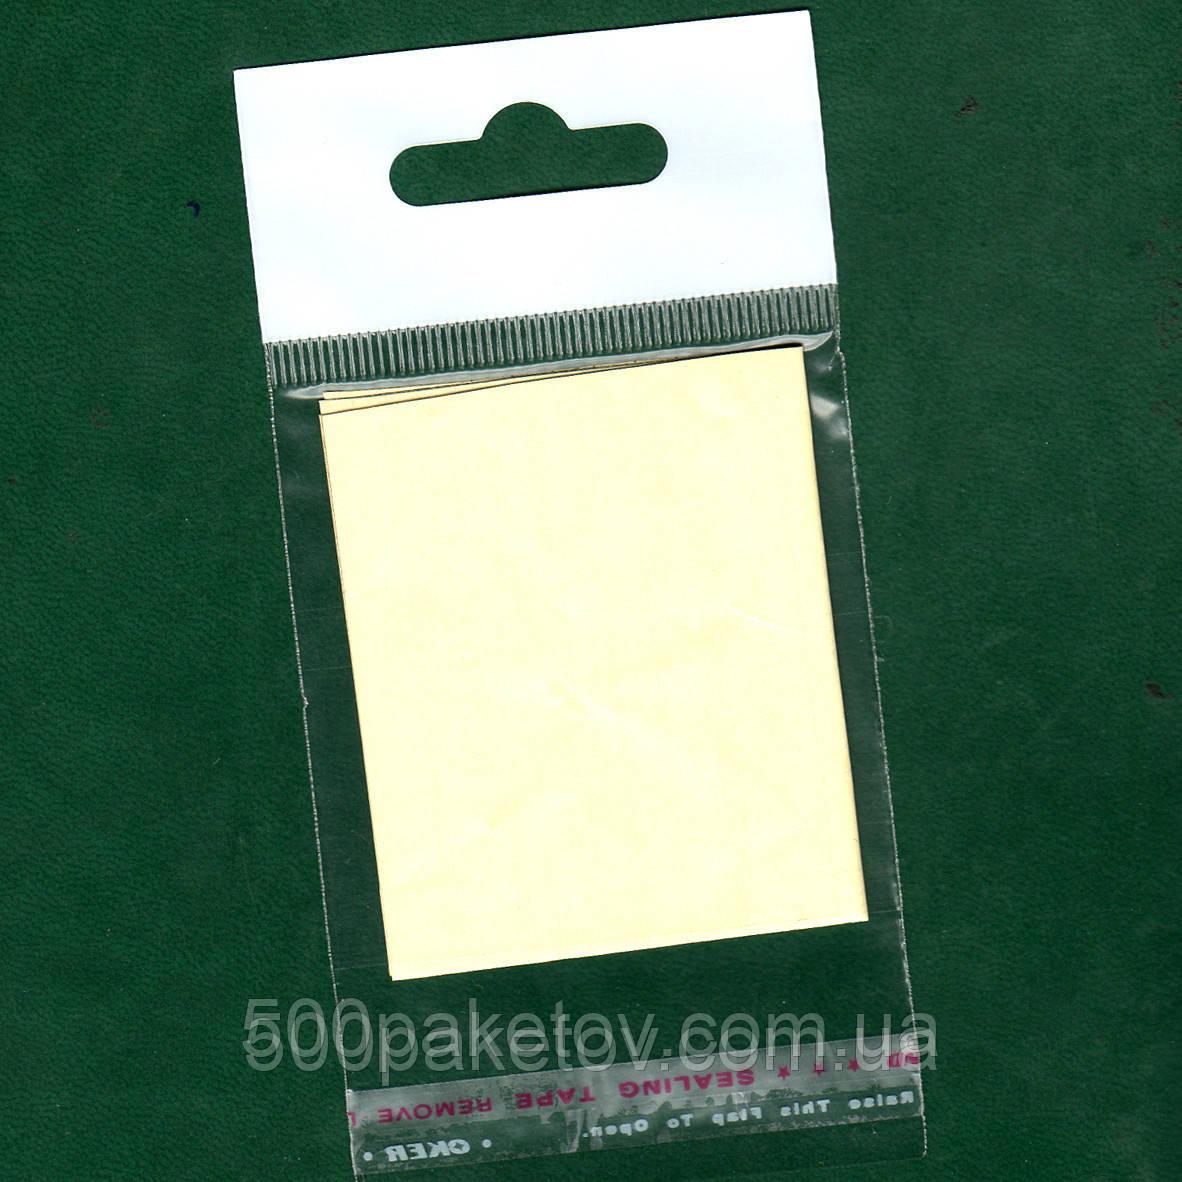 Пакет с еврослотом 30,5х21,5cм +к/л (40мкм)